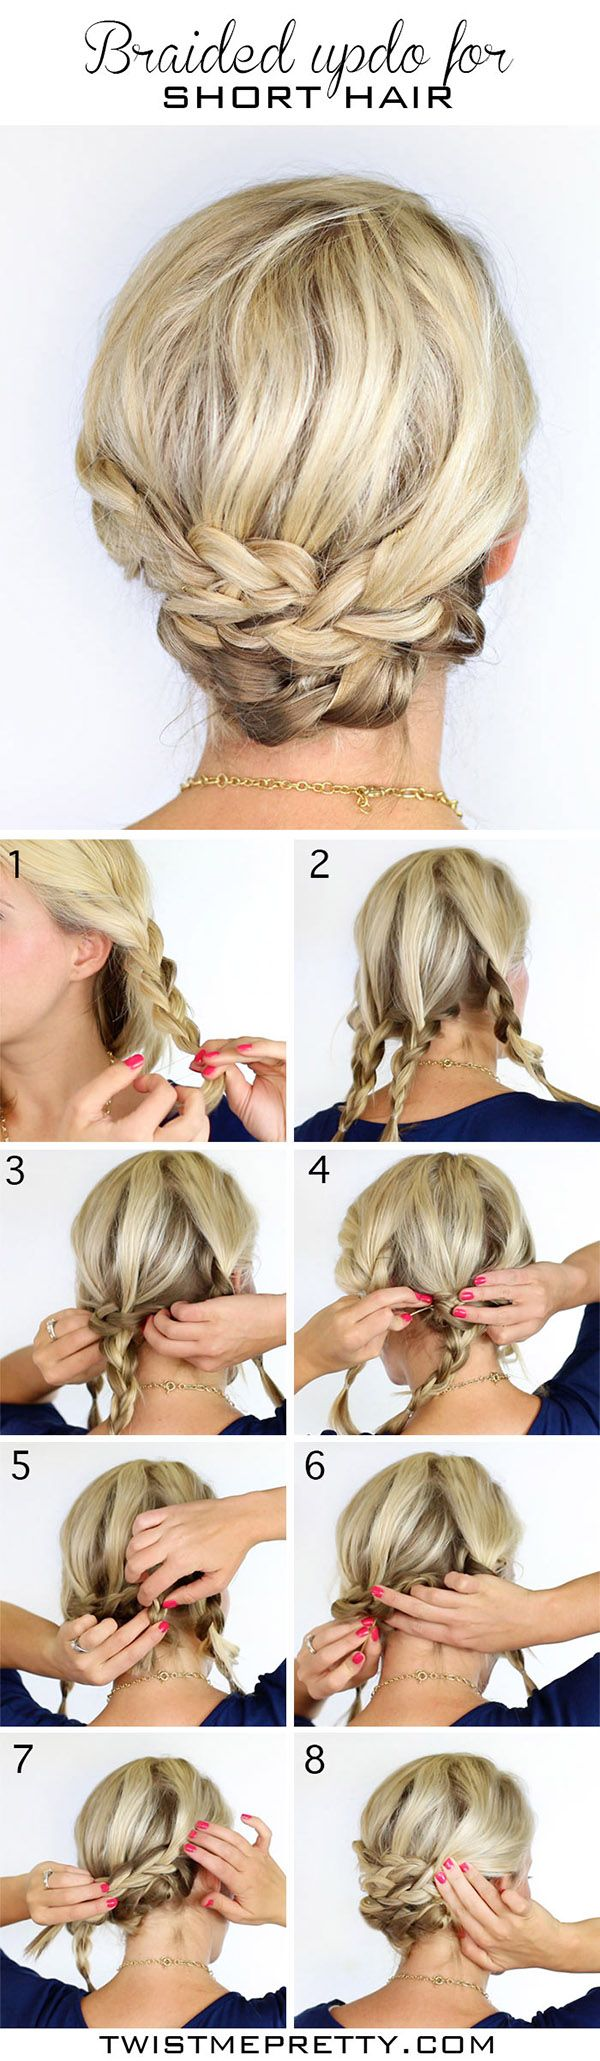 20 Diy Wedding Hairstyles With Tutorials To Try On Your Own Elegantweddinginvites Com Blog Hair Styles Braided Hairstyles Updo Short Hair Styles